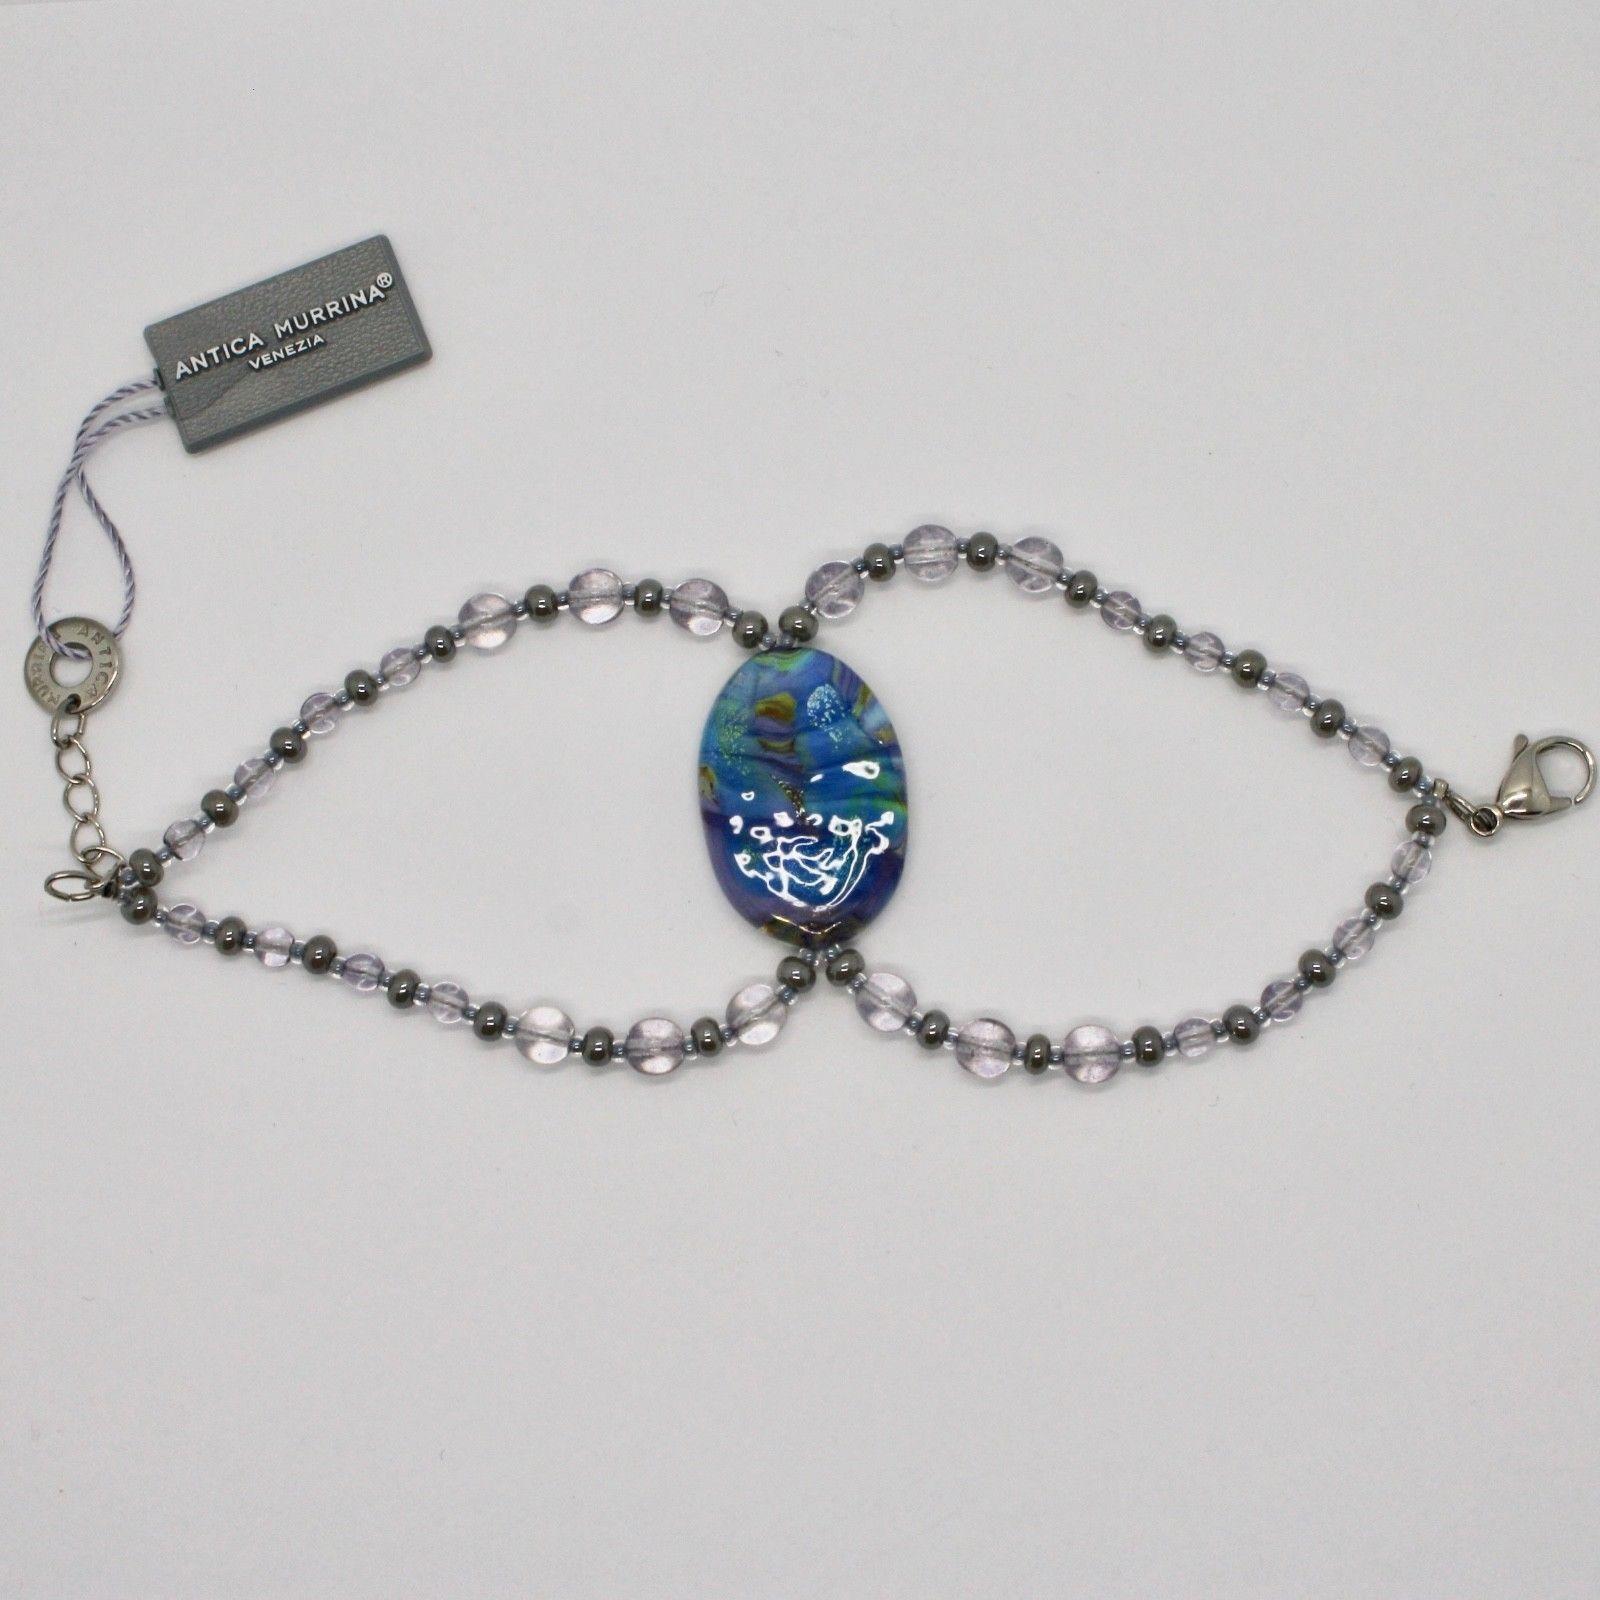 BRACELET ANTICA MURRINA VENEZIA WITH MURANO GLASS BLUE PURPLE GRAY BR795A07